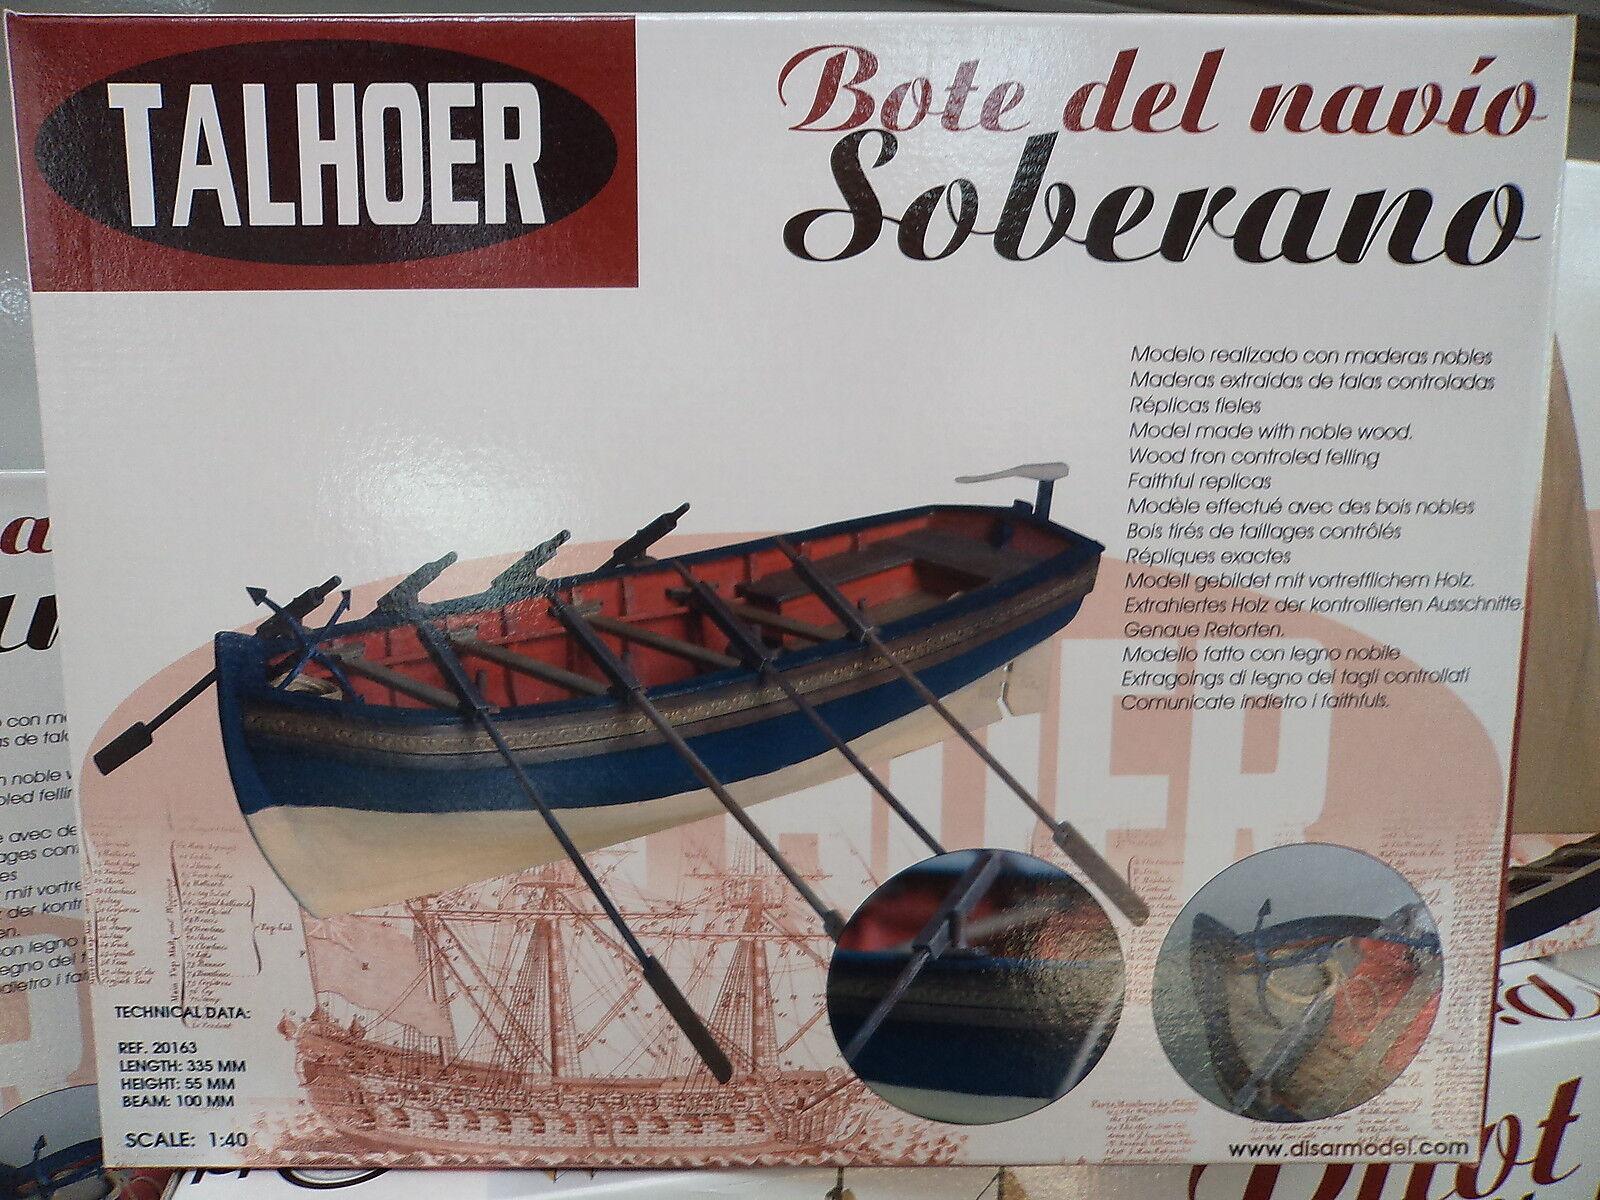 Talhoer 20163 - Kit maqueta bote del navio Soberano